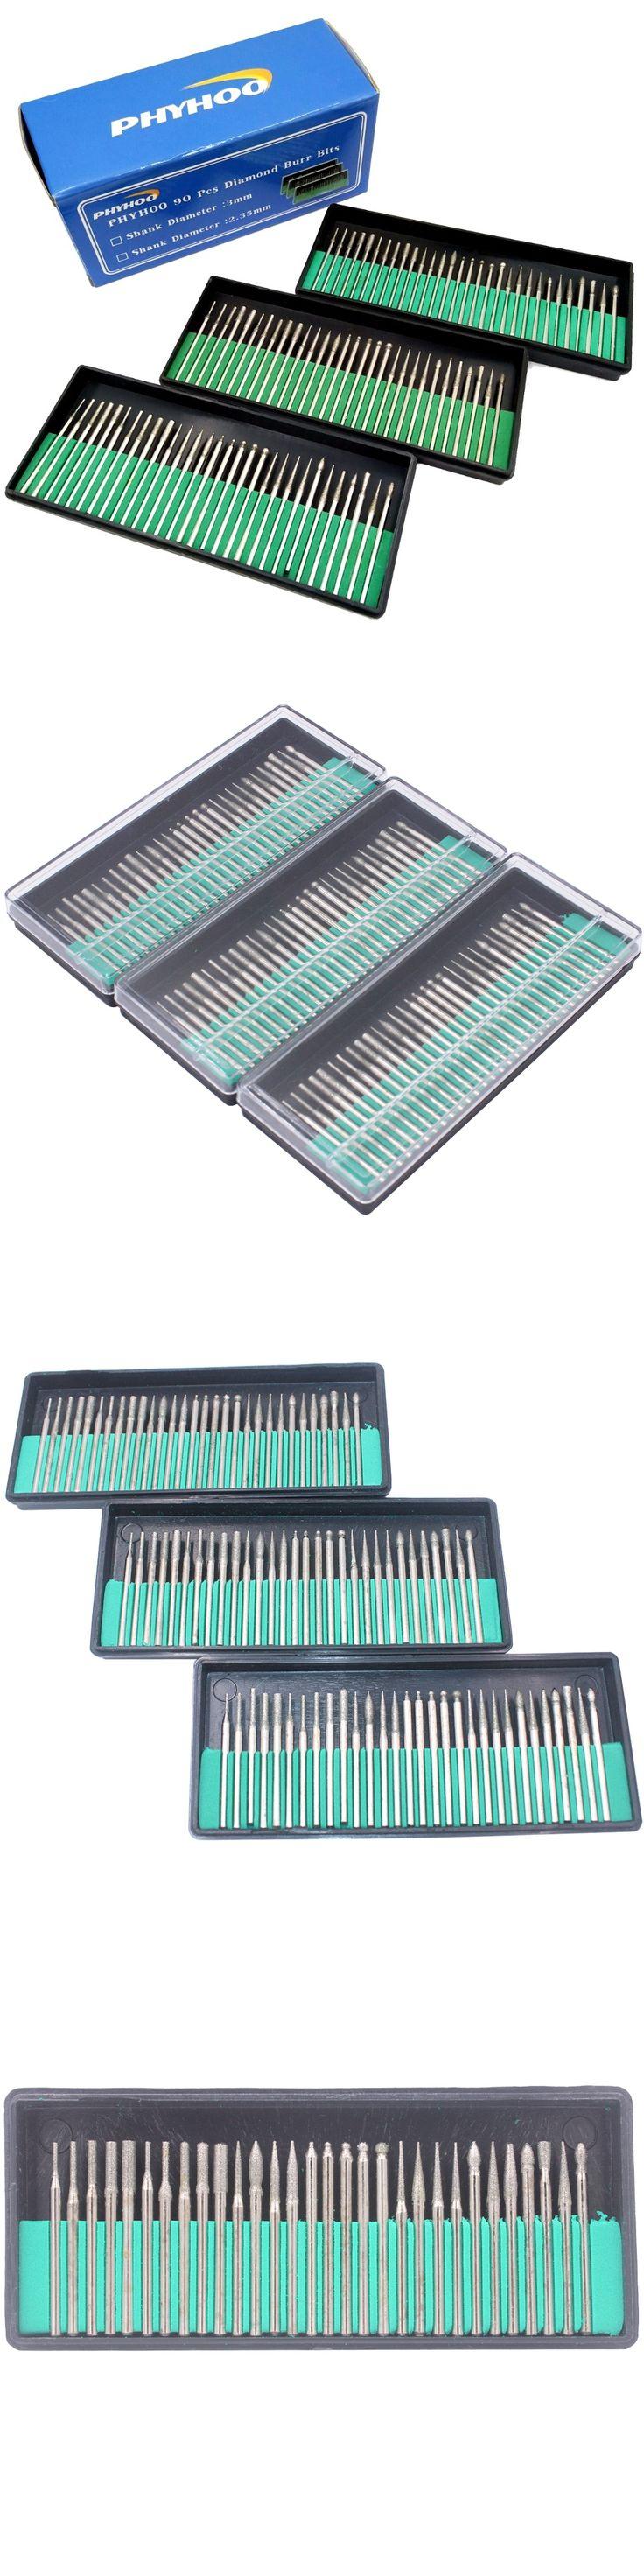 "1/8"" 90pcs Shank Diamond Burr Bits Set Drill Bit Kit for Glass Gemstone Metal Dremel Grinding Craftman Rotary Tool"